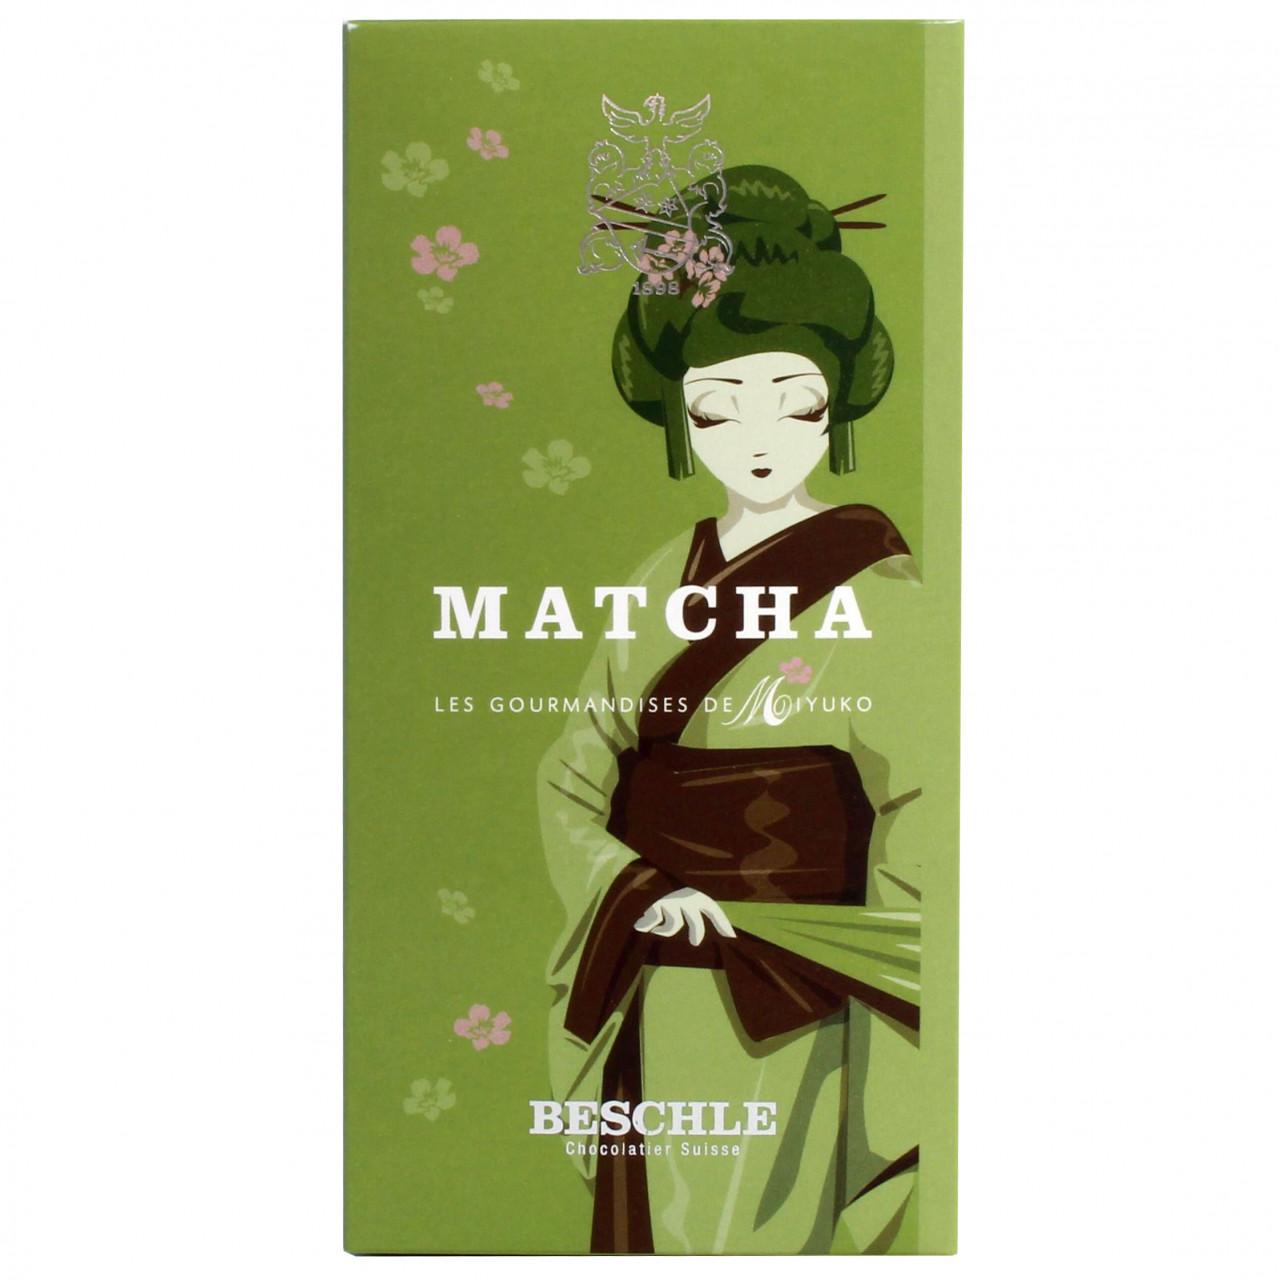 Schokolade mit Matcha Tee, weisse Schokolade, Joghurt Schokolade, Schweiz, schweizer Schokolade - Chocolate with Matcha - Chocolats-De-Luxe